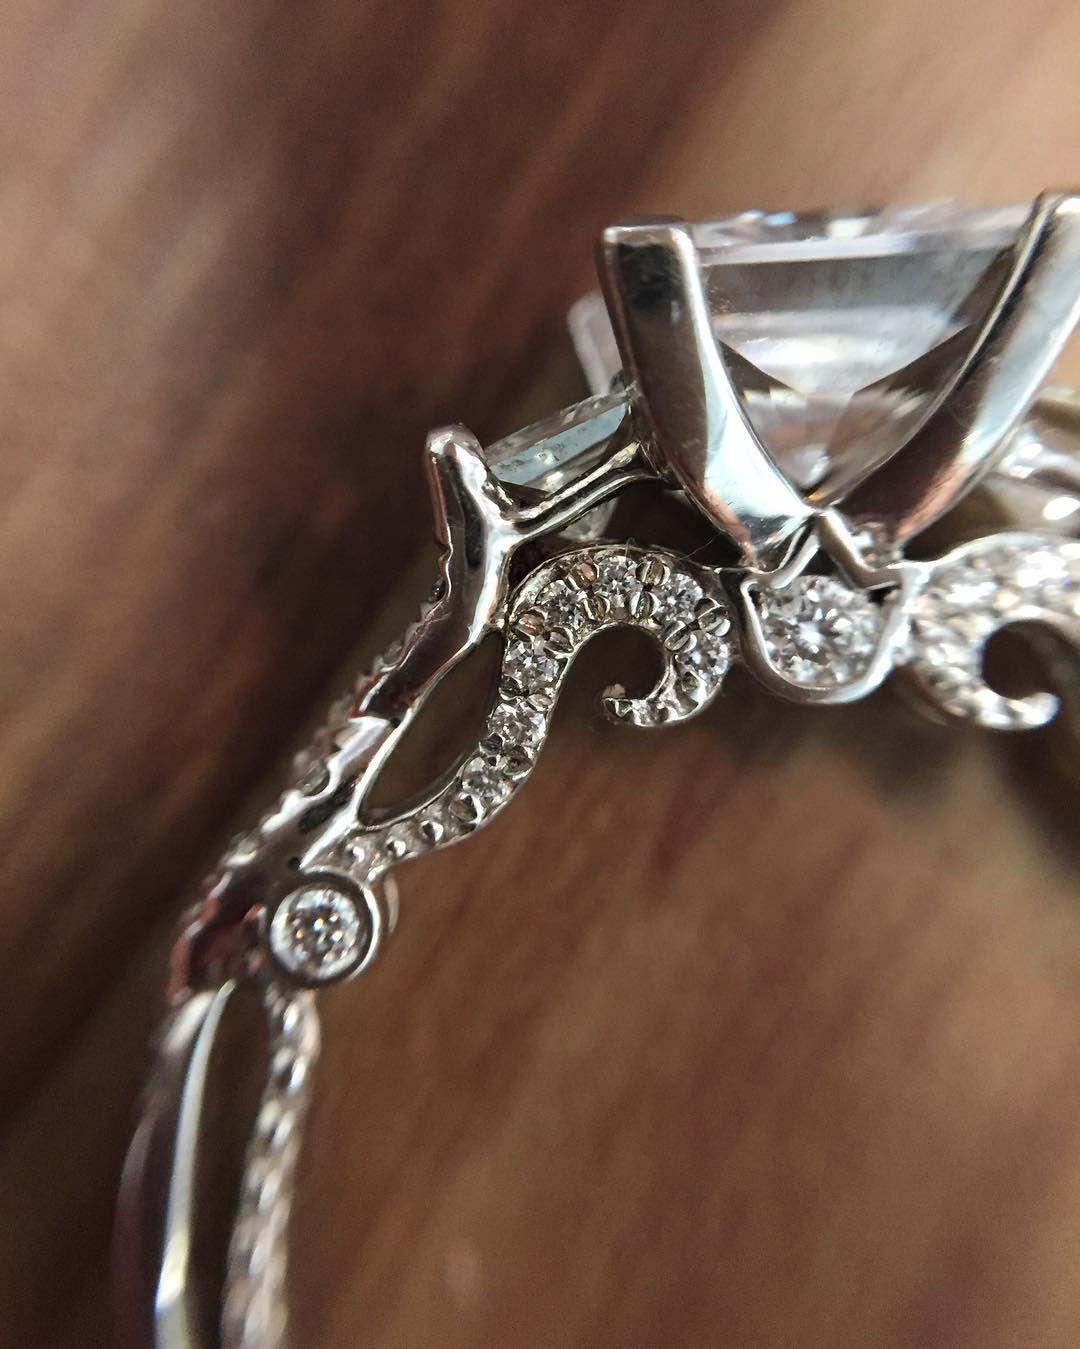 bed371e7d72e9 Verragio Ladies 18K White Gold Diamond Engagement Ring Setting ...